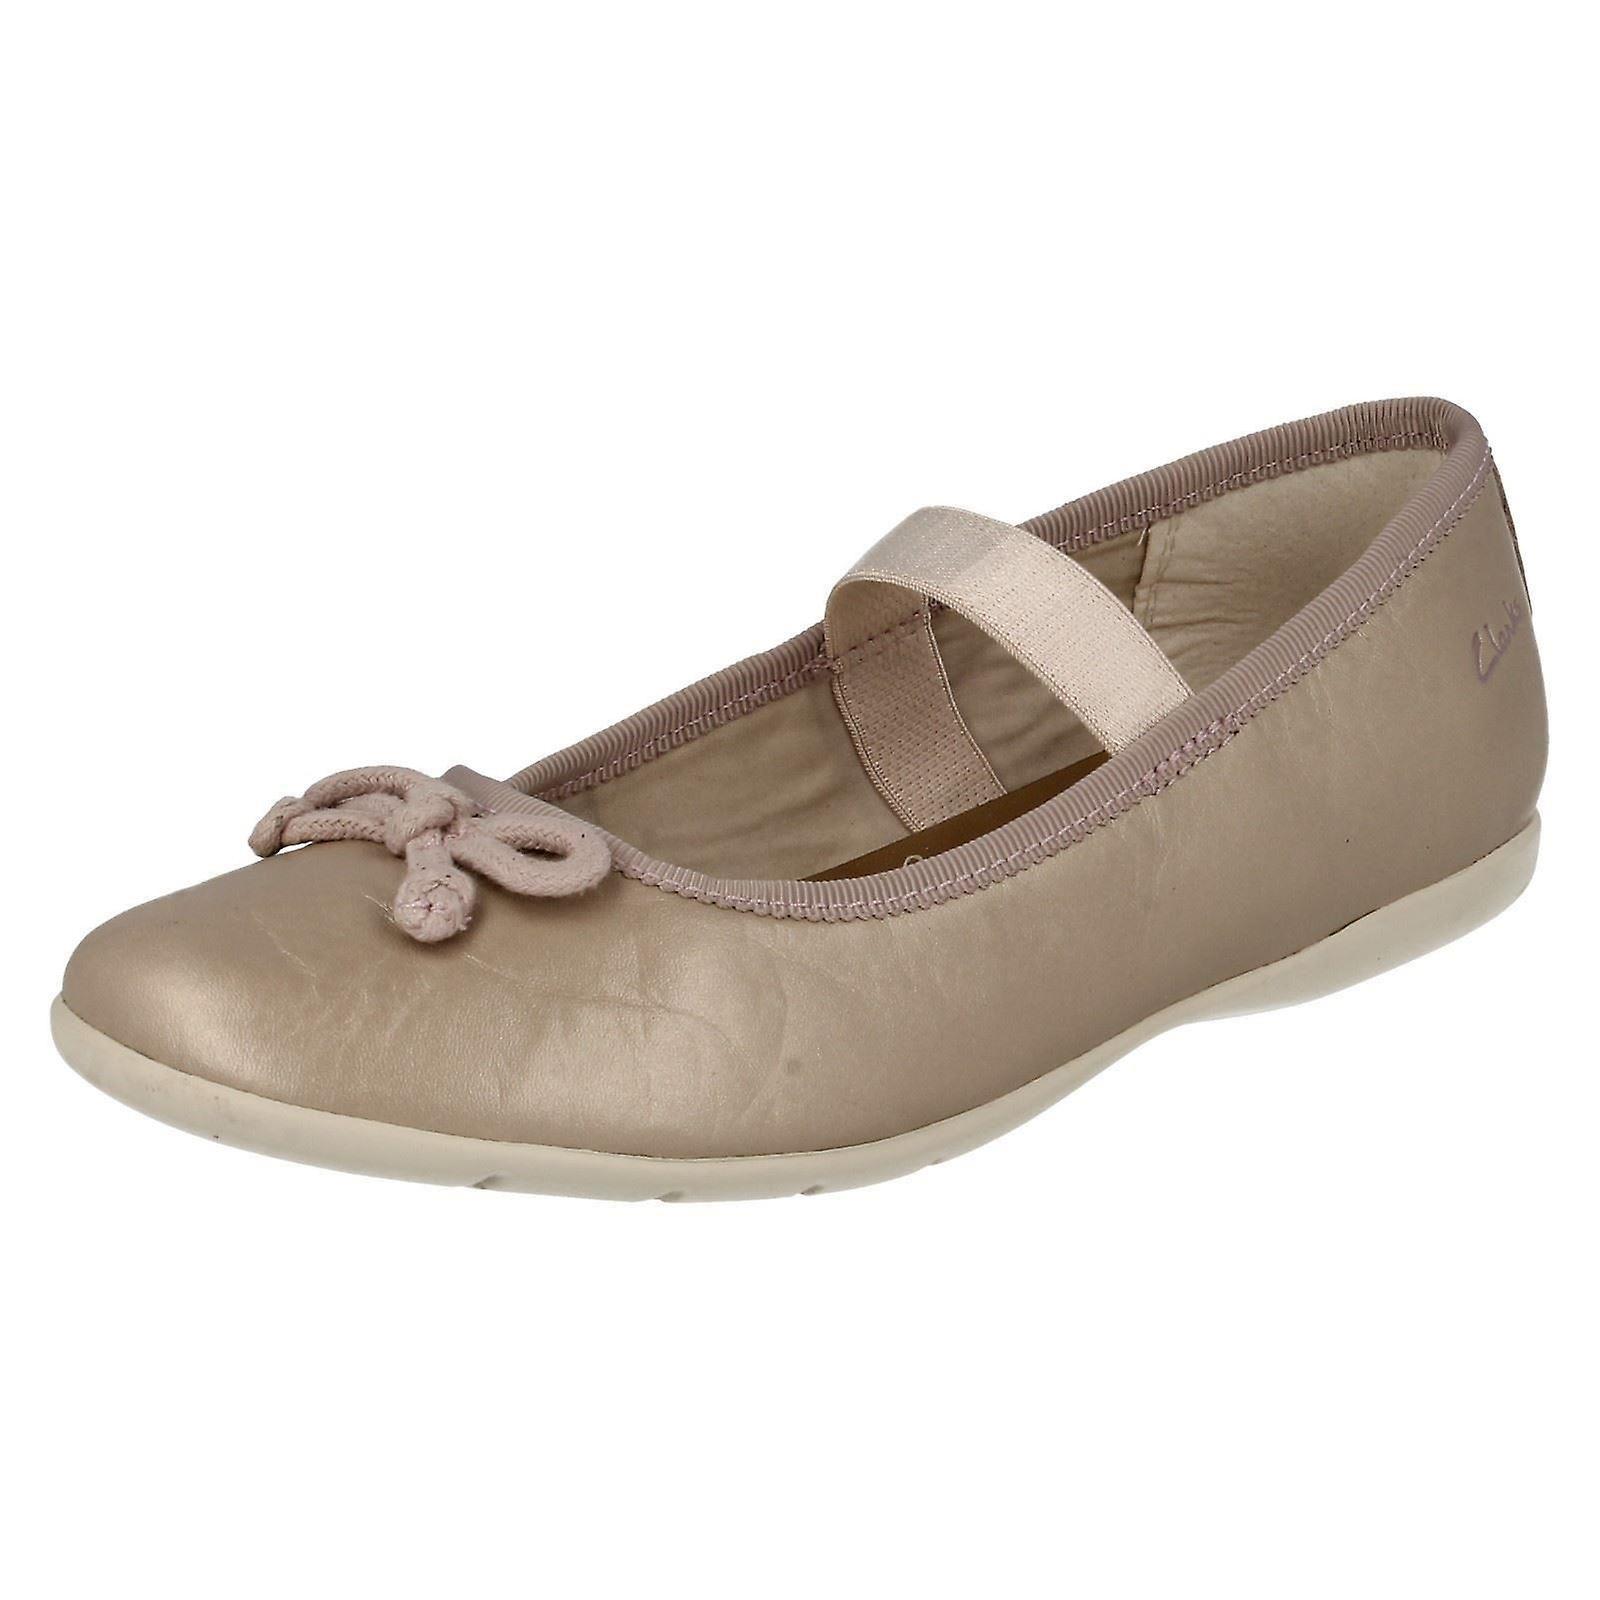 Clarks Casual Mary Jane Schuhe Mädchen tanzen